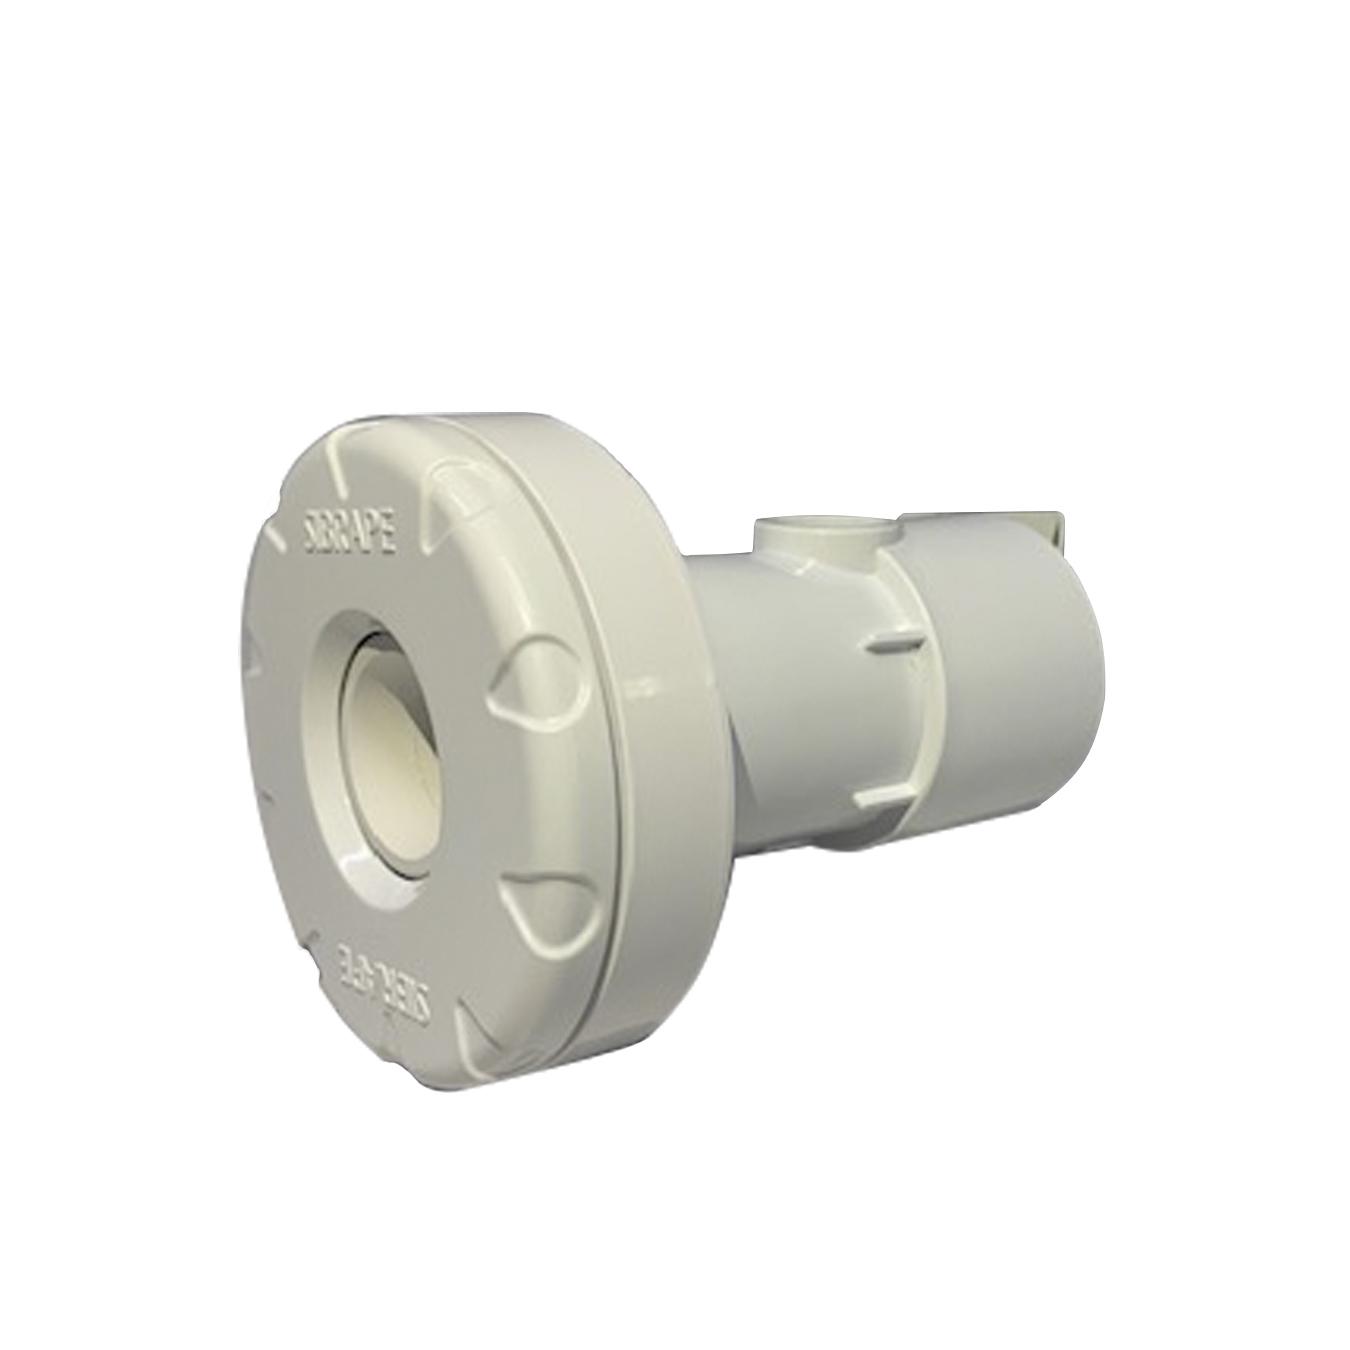 Dispositivo Alvenaria Hidro CMBAQUA ABS Sibrape